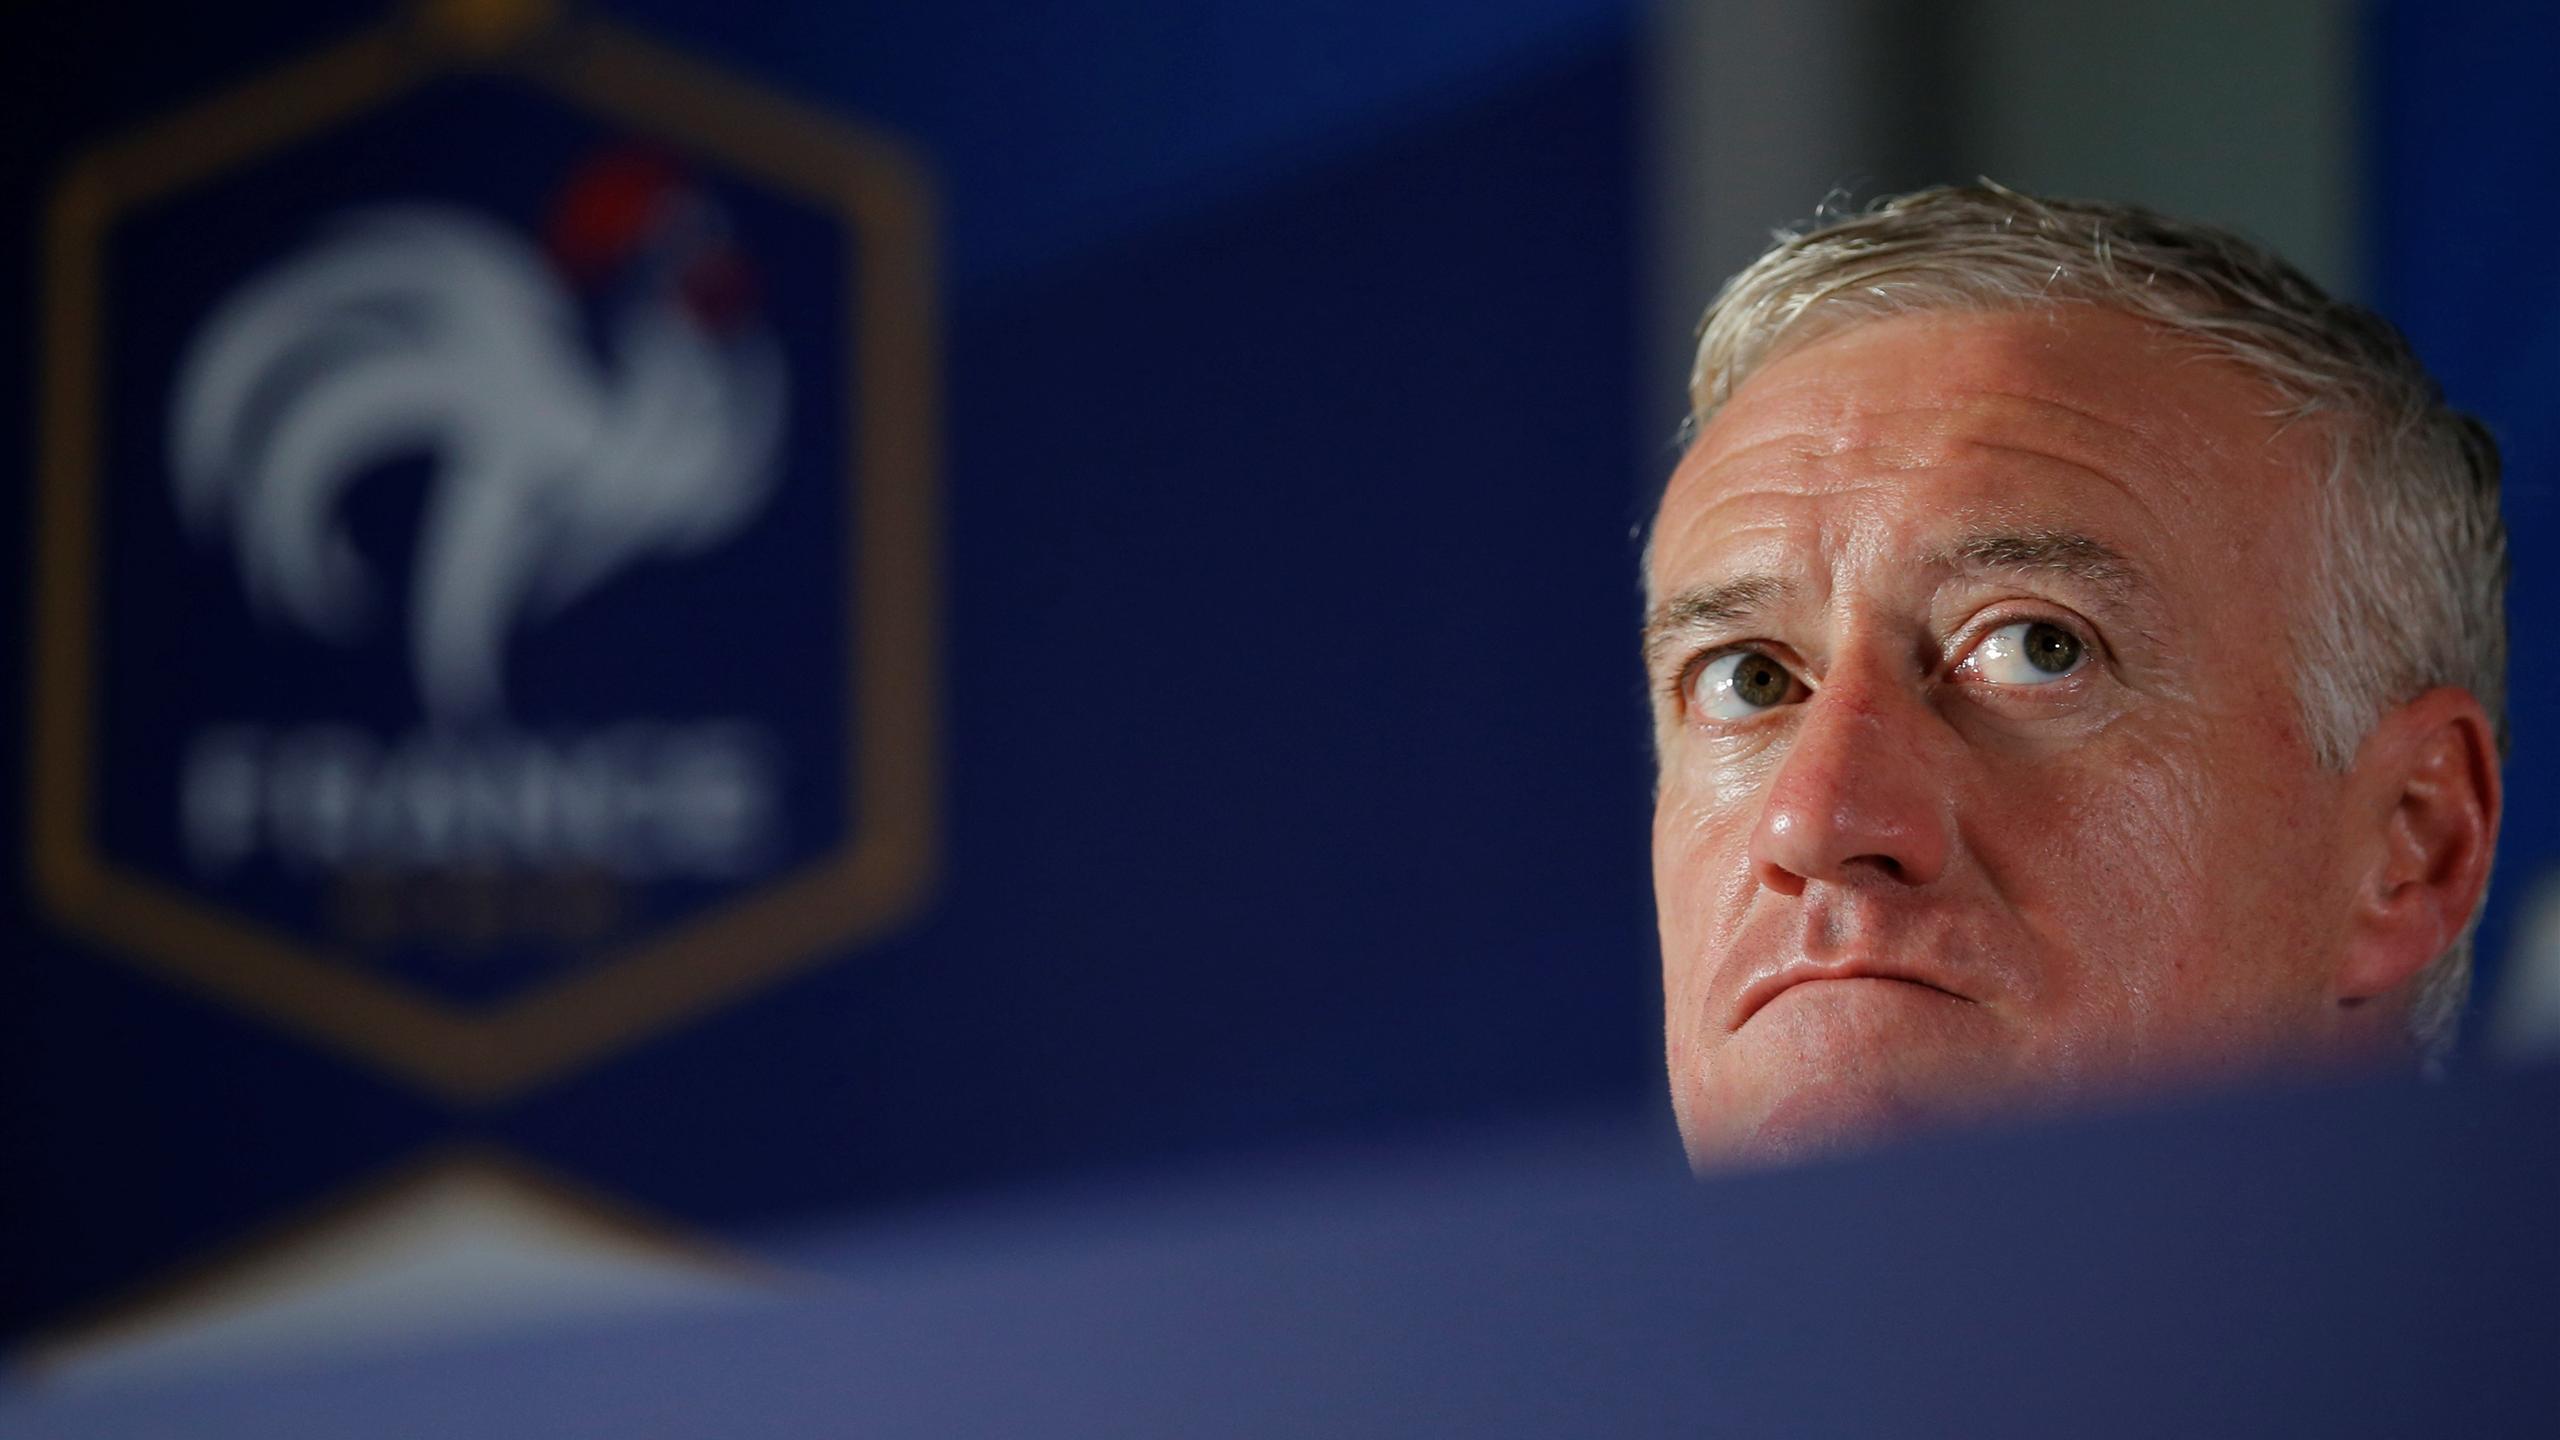 France's national soccer team coach Didier Deschamps attends a news conference